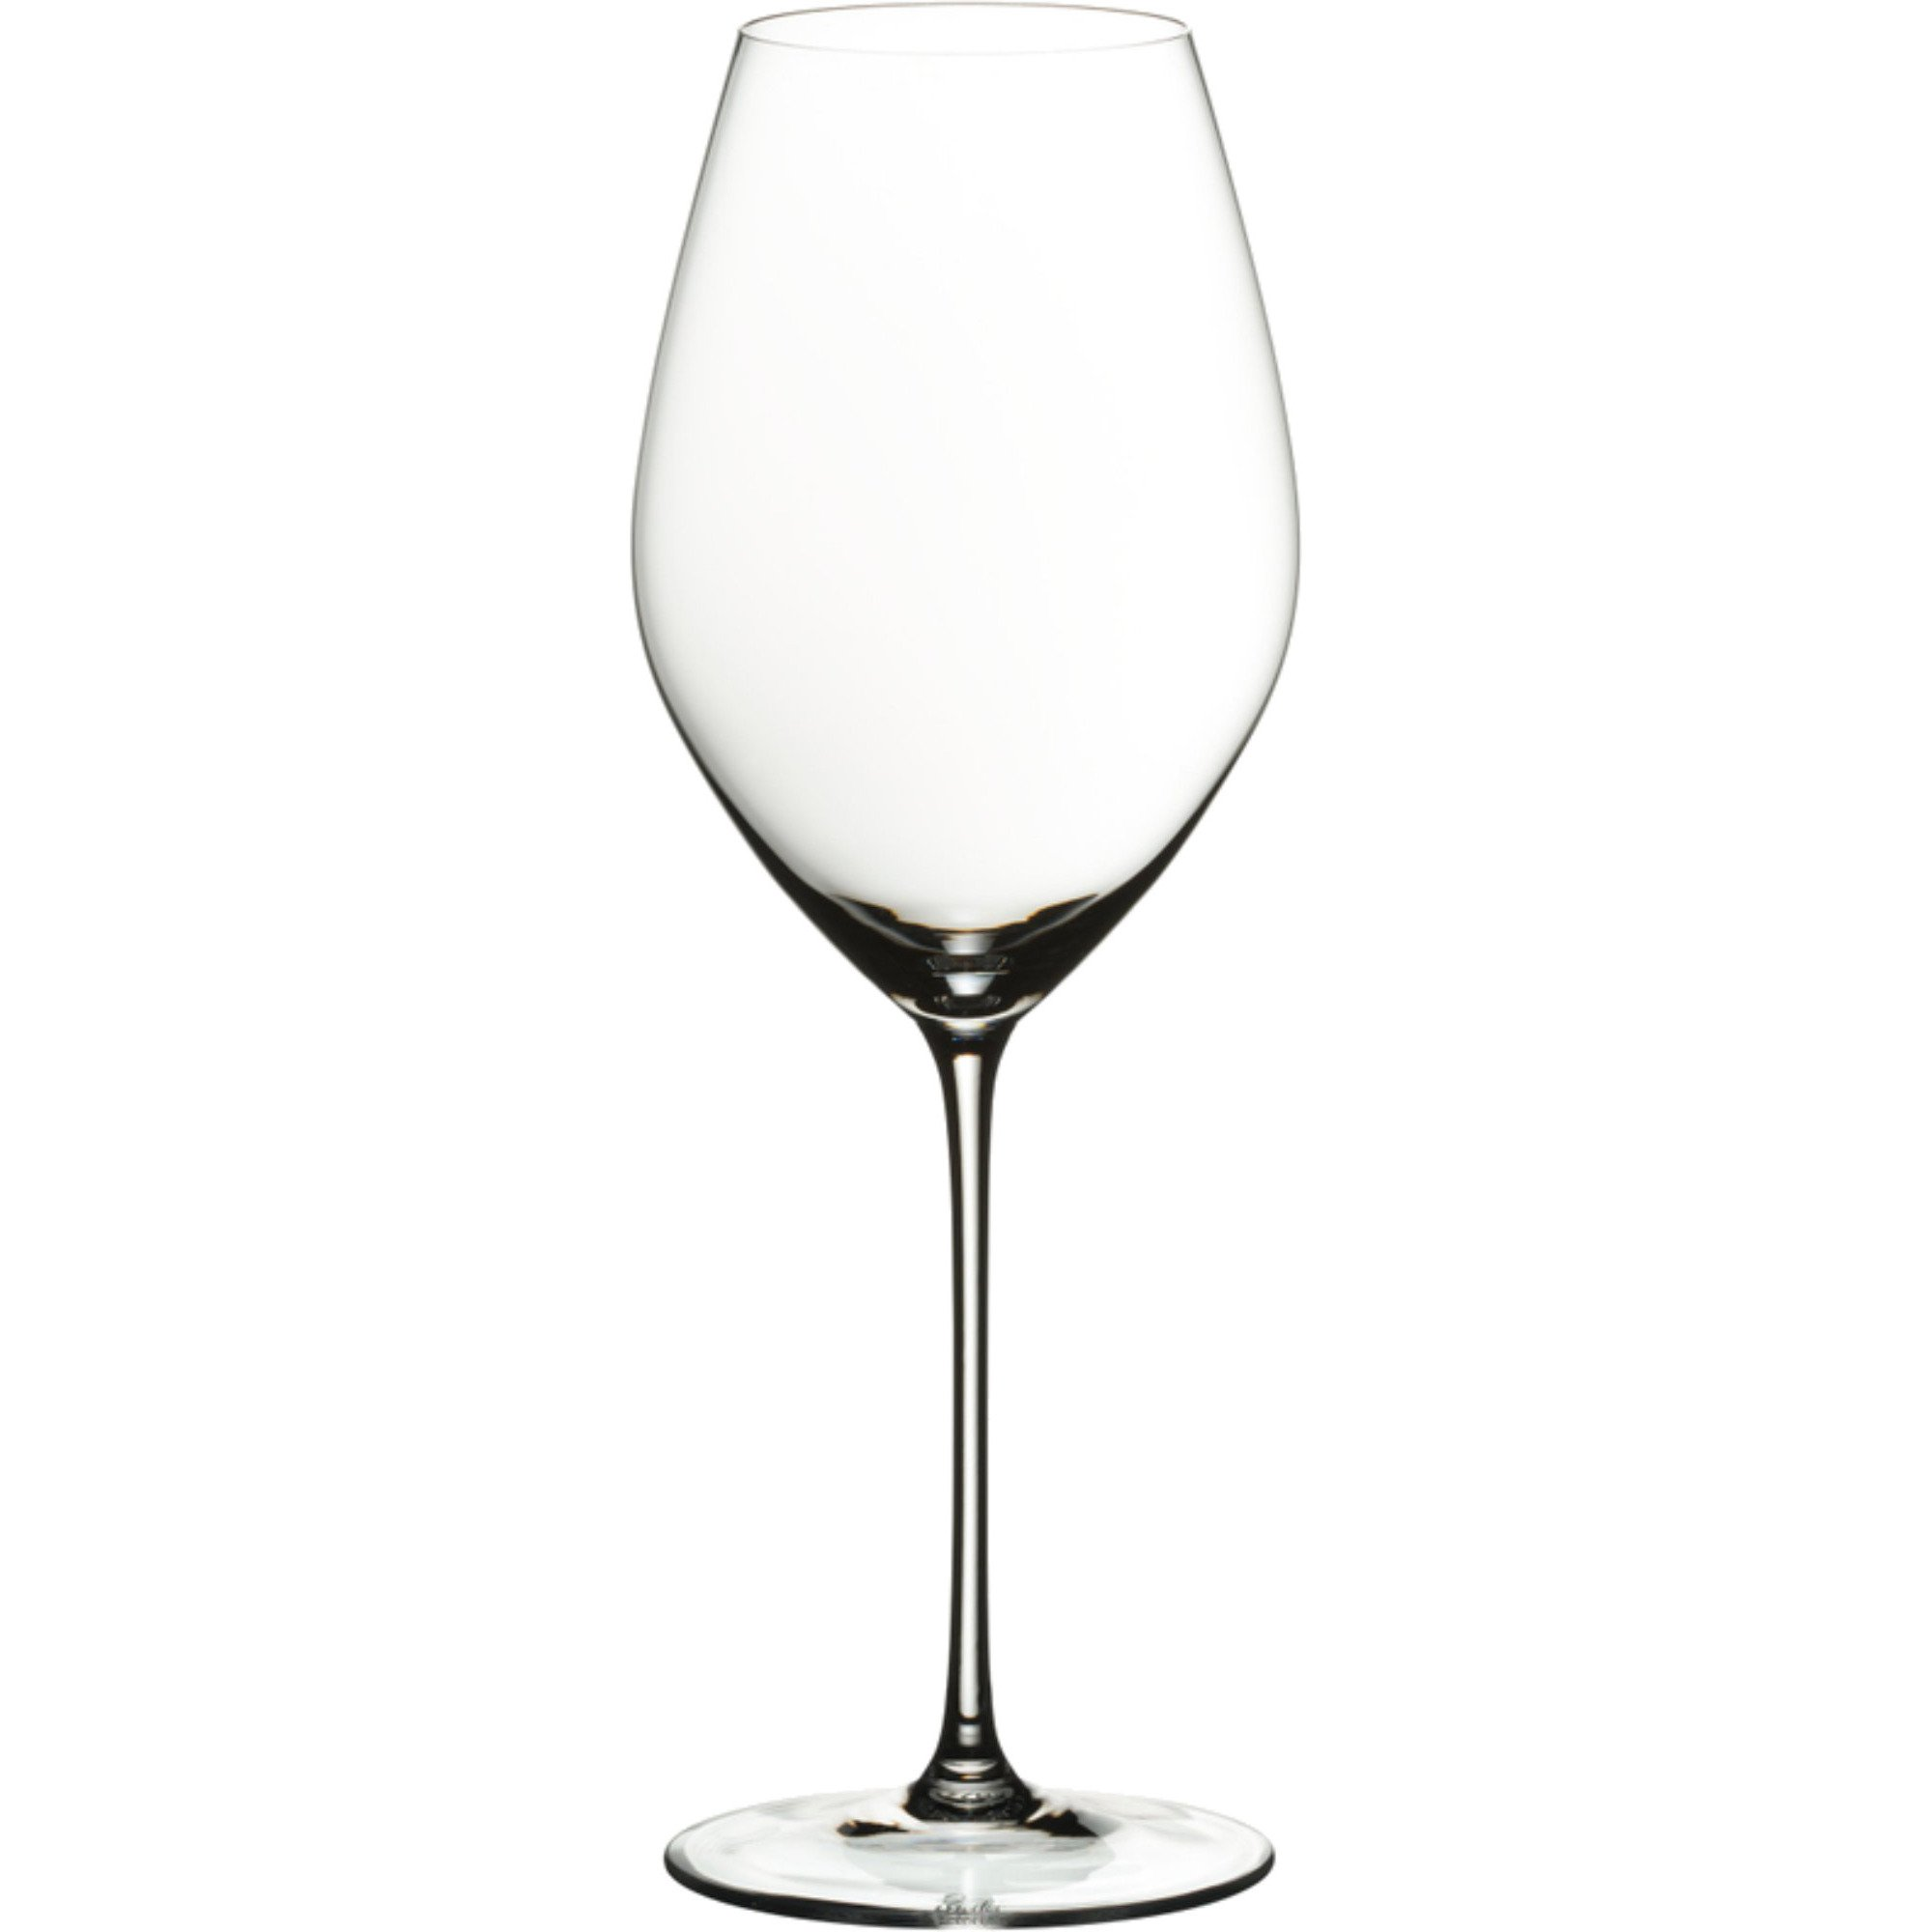 Riedel Veritas Champagneglas 445 cl 2-pack